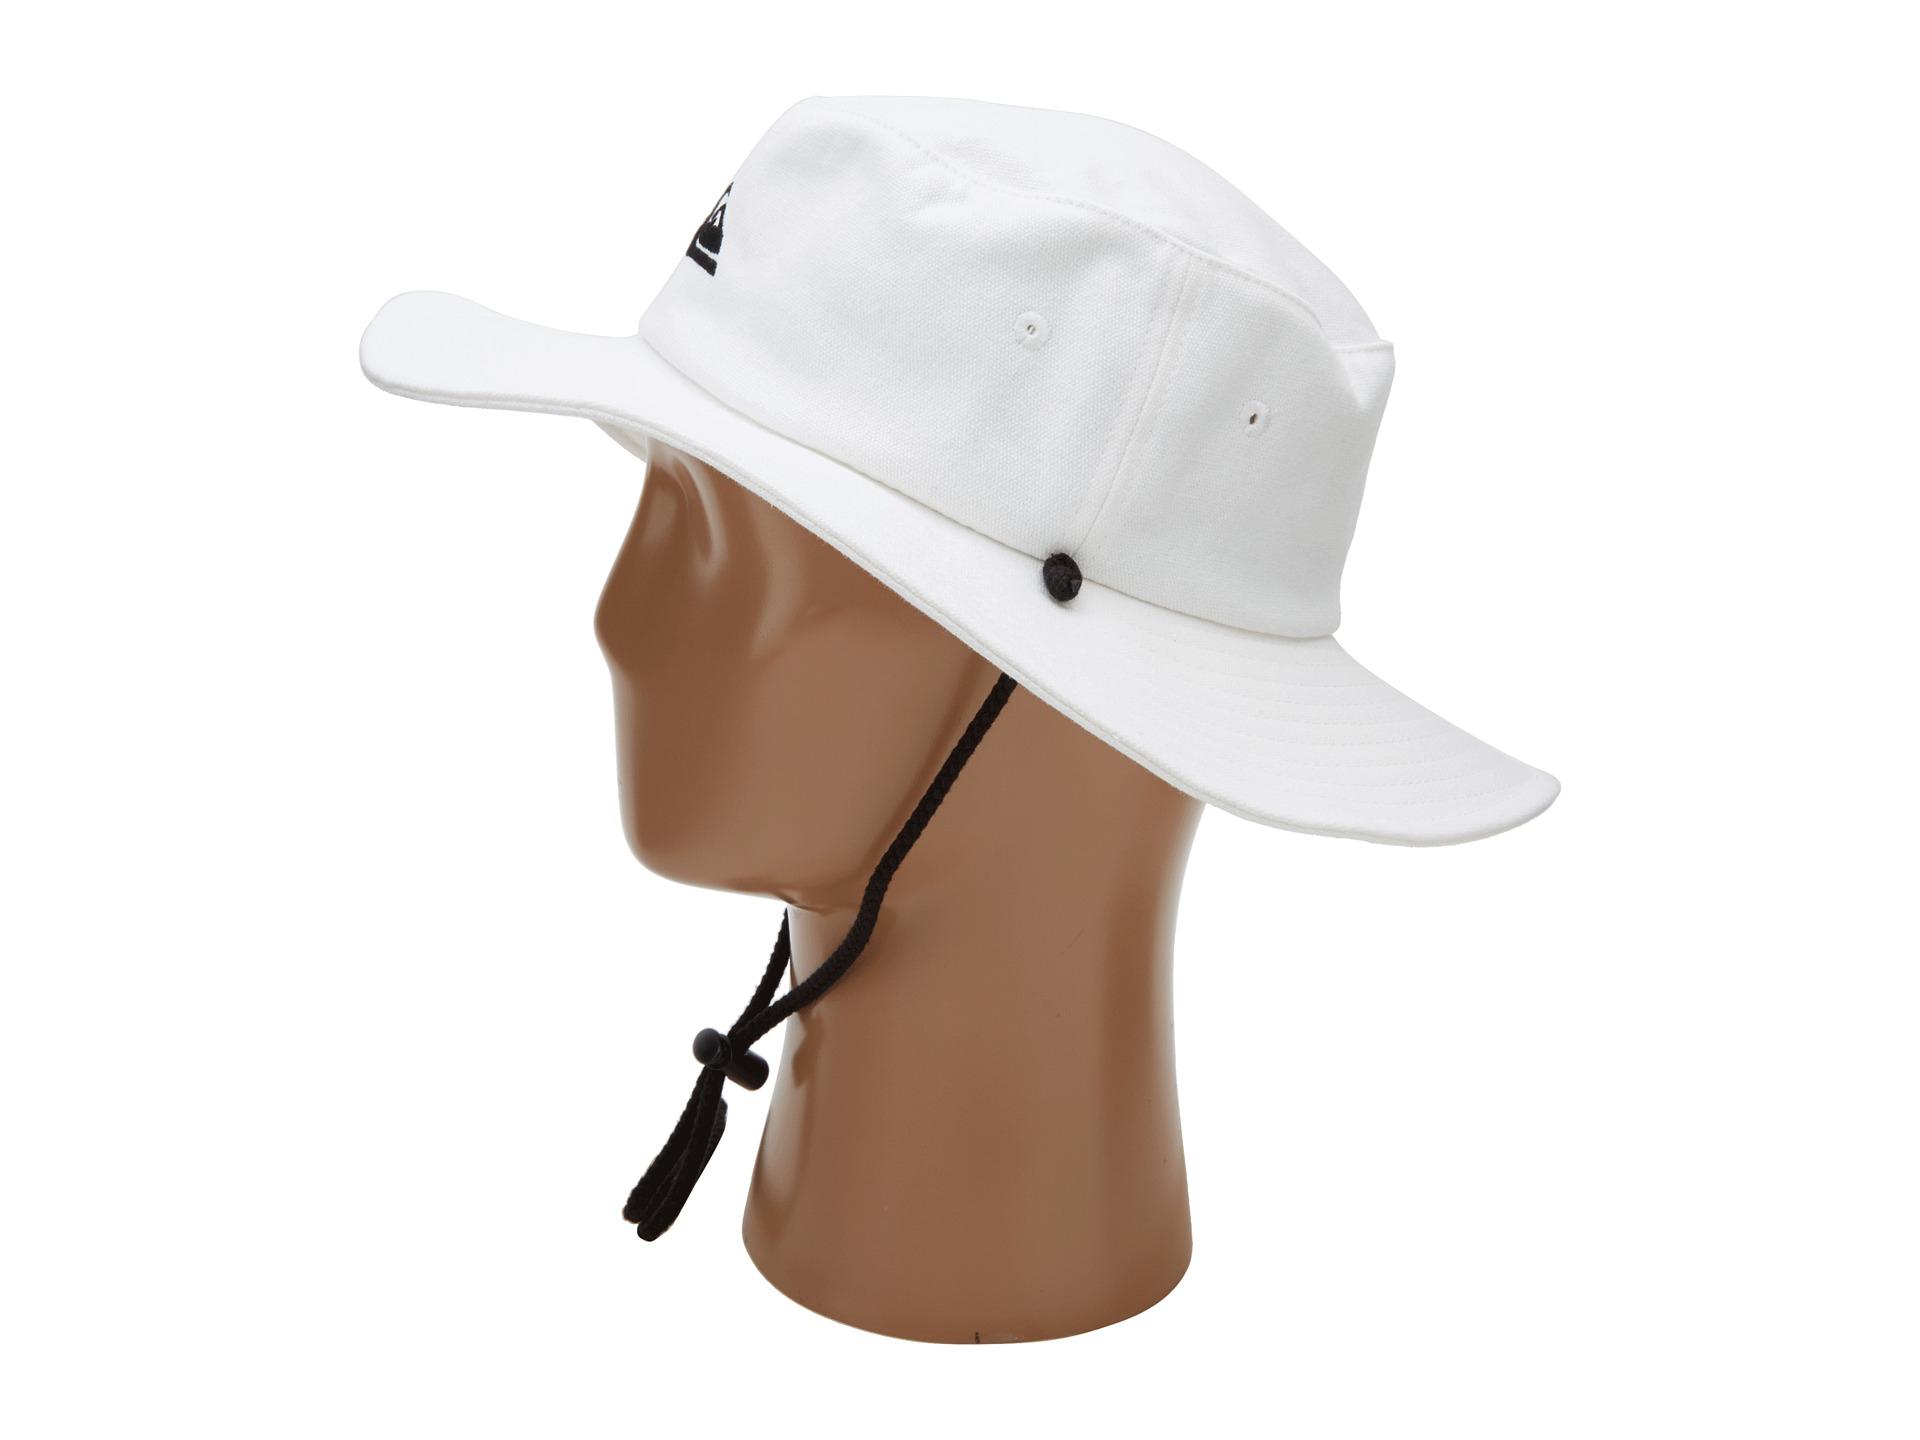 6d93d6481974c1 coupon bushmaster light fishing hat by quiksilver d2862 19a25; spain lyst  quiksilver original bushmaster hat in white for men 7ad00 b4c1e